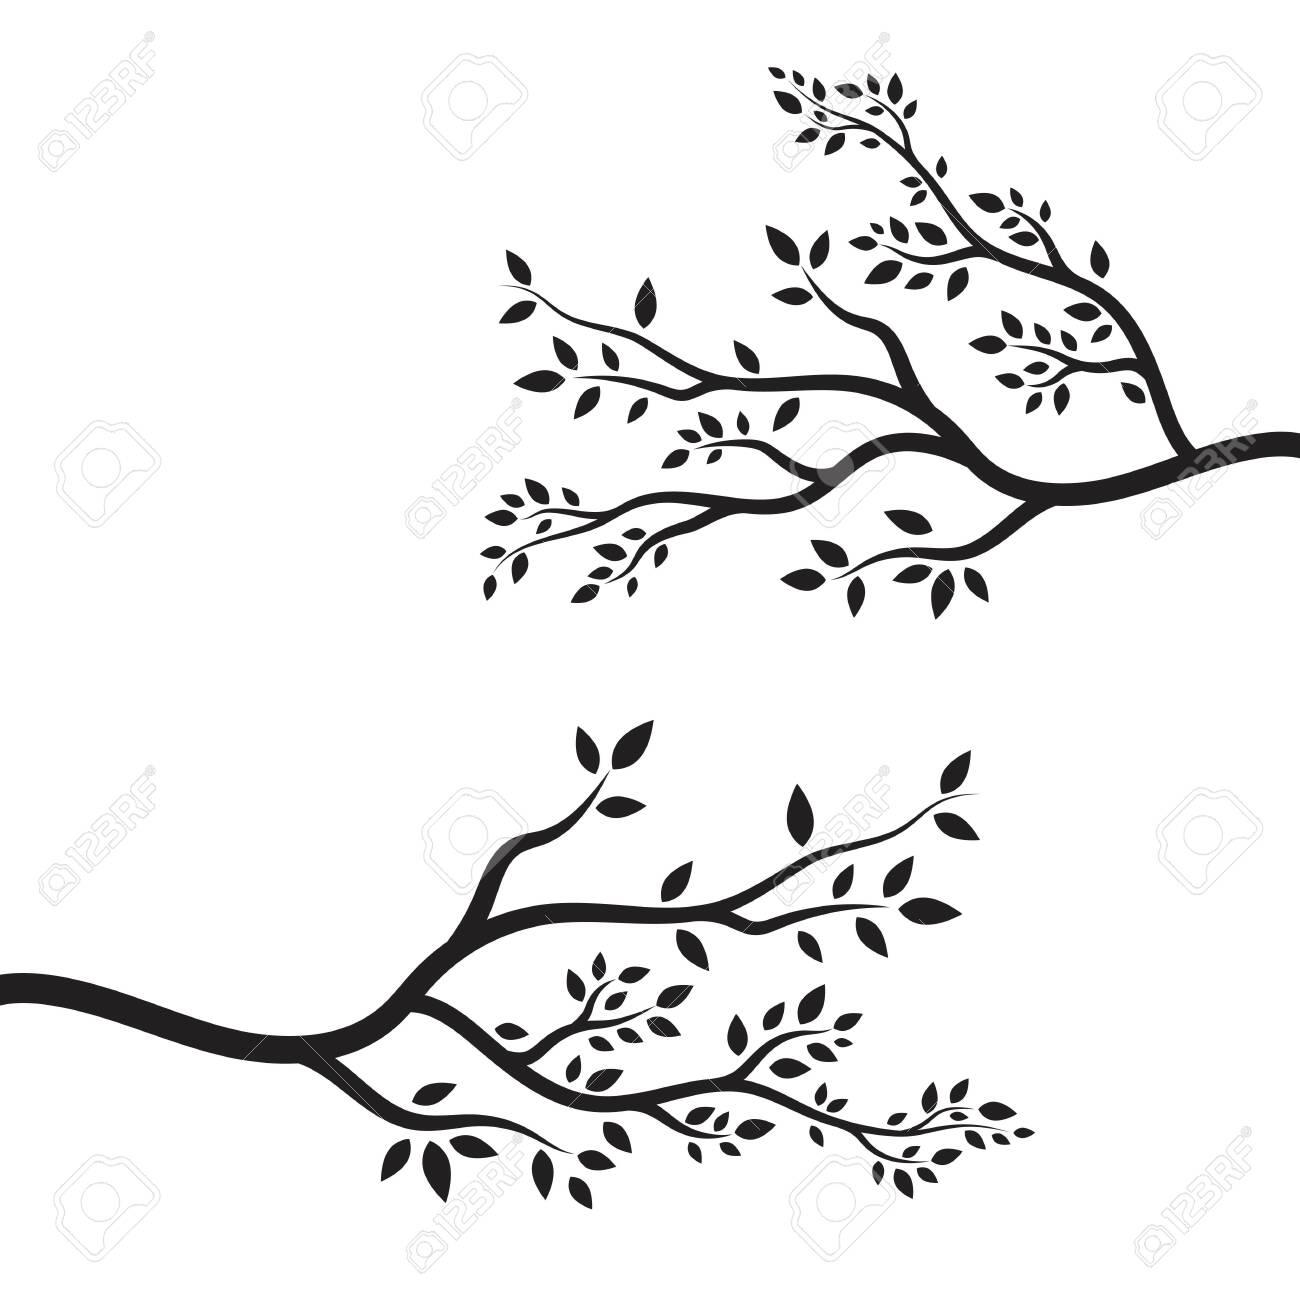 tree branch vector ilustration design template - 144957698